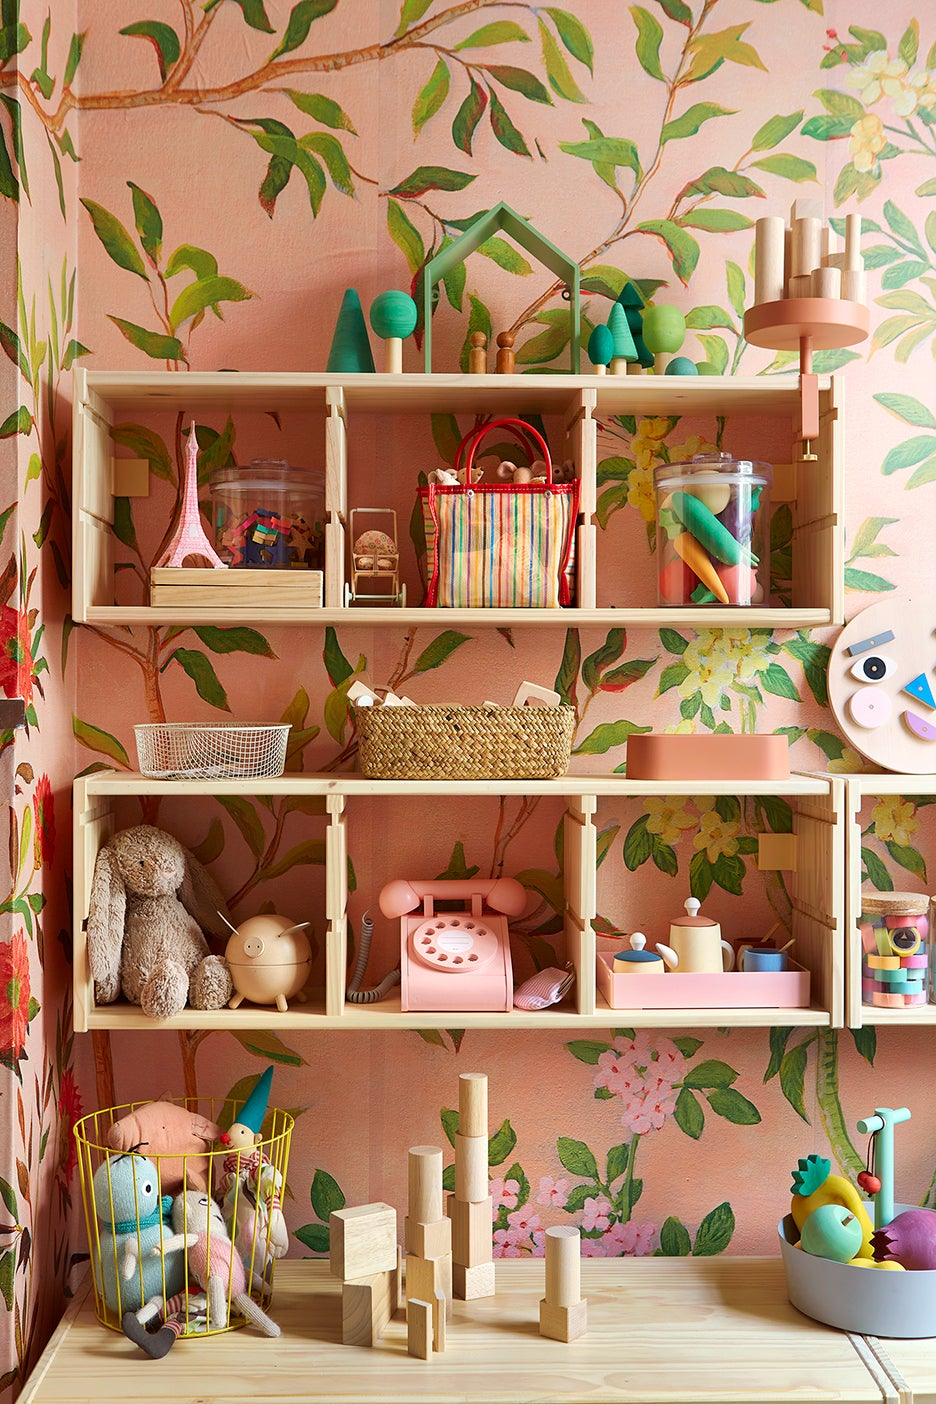 a kids bedroom shelving